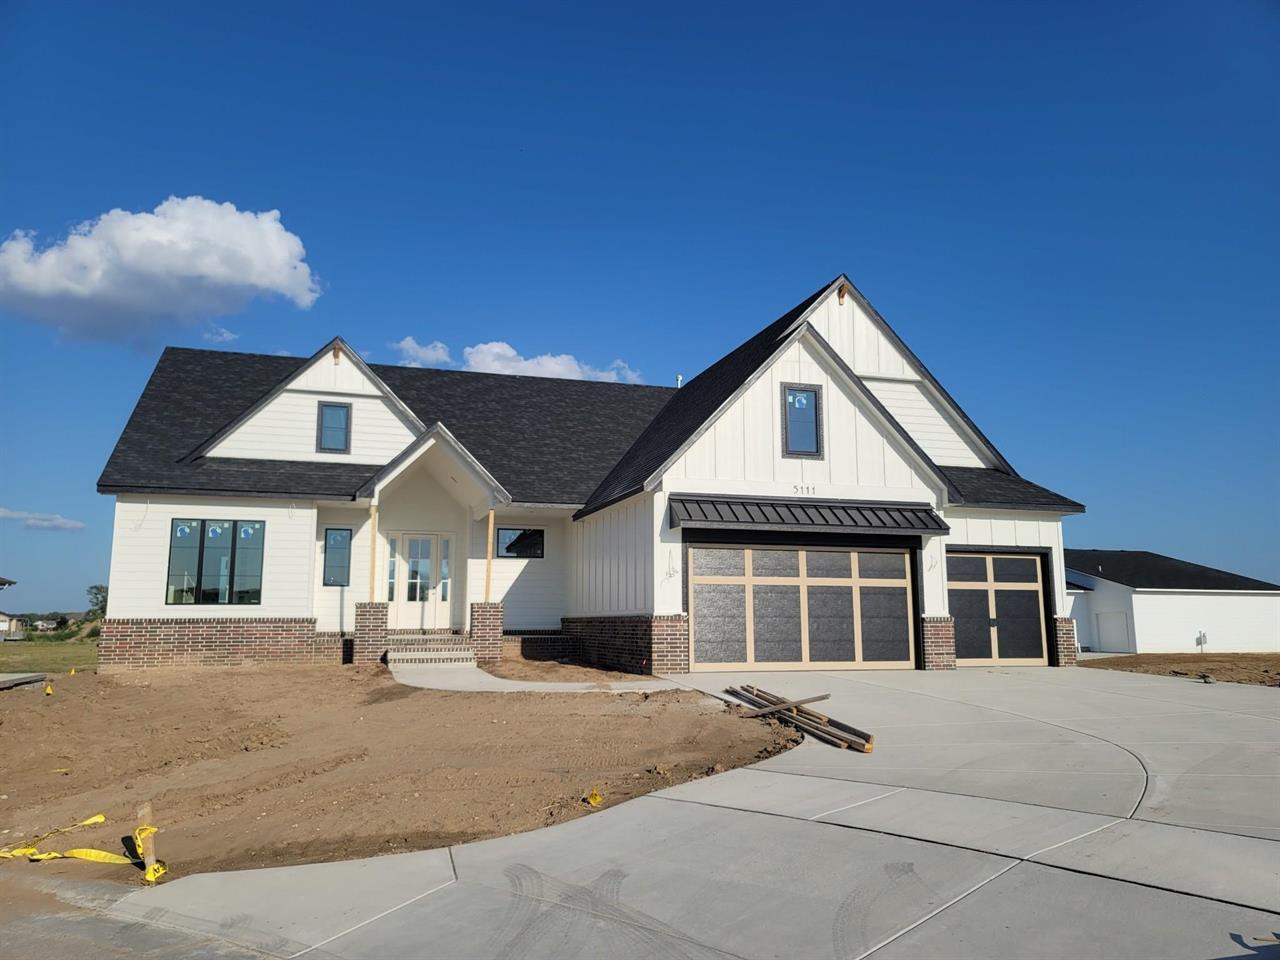 For Sale: 5111 W 26th Ct. N., Wichita, KS 67205,